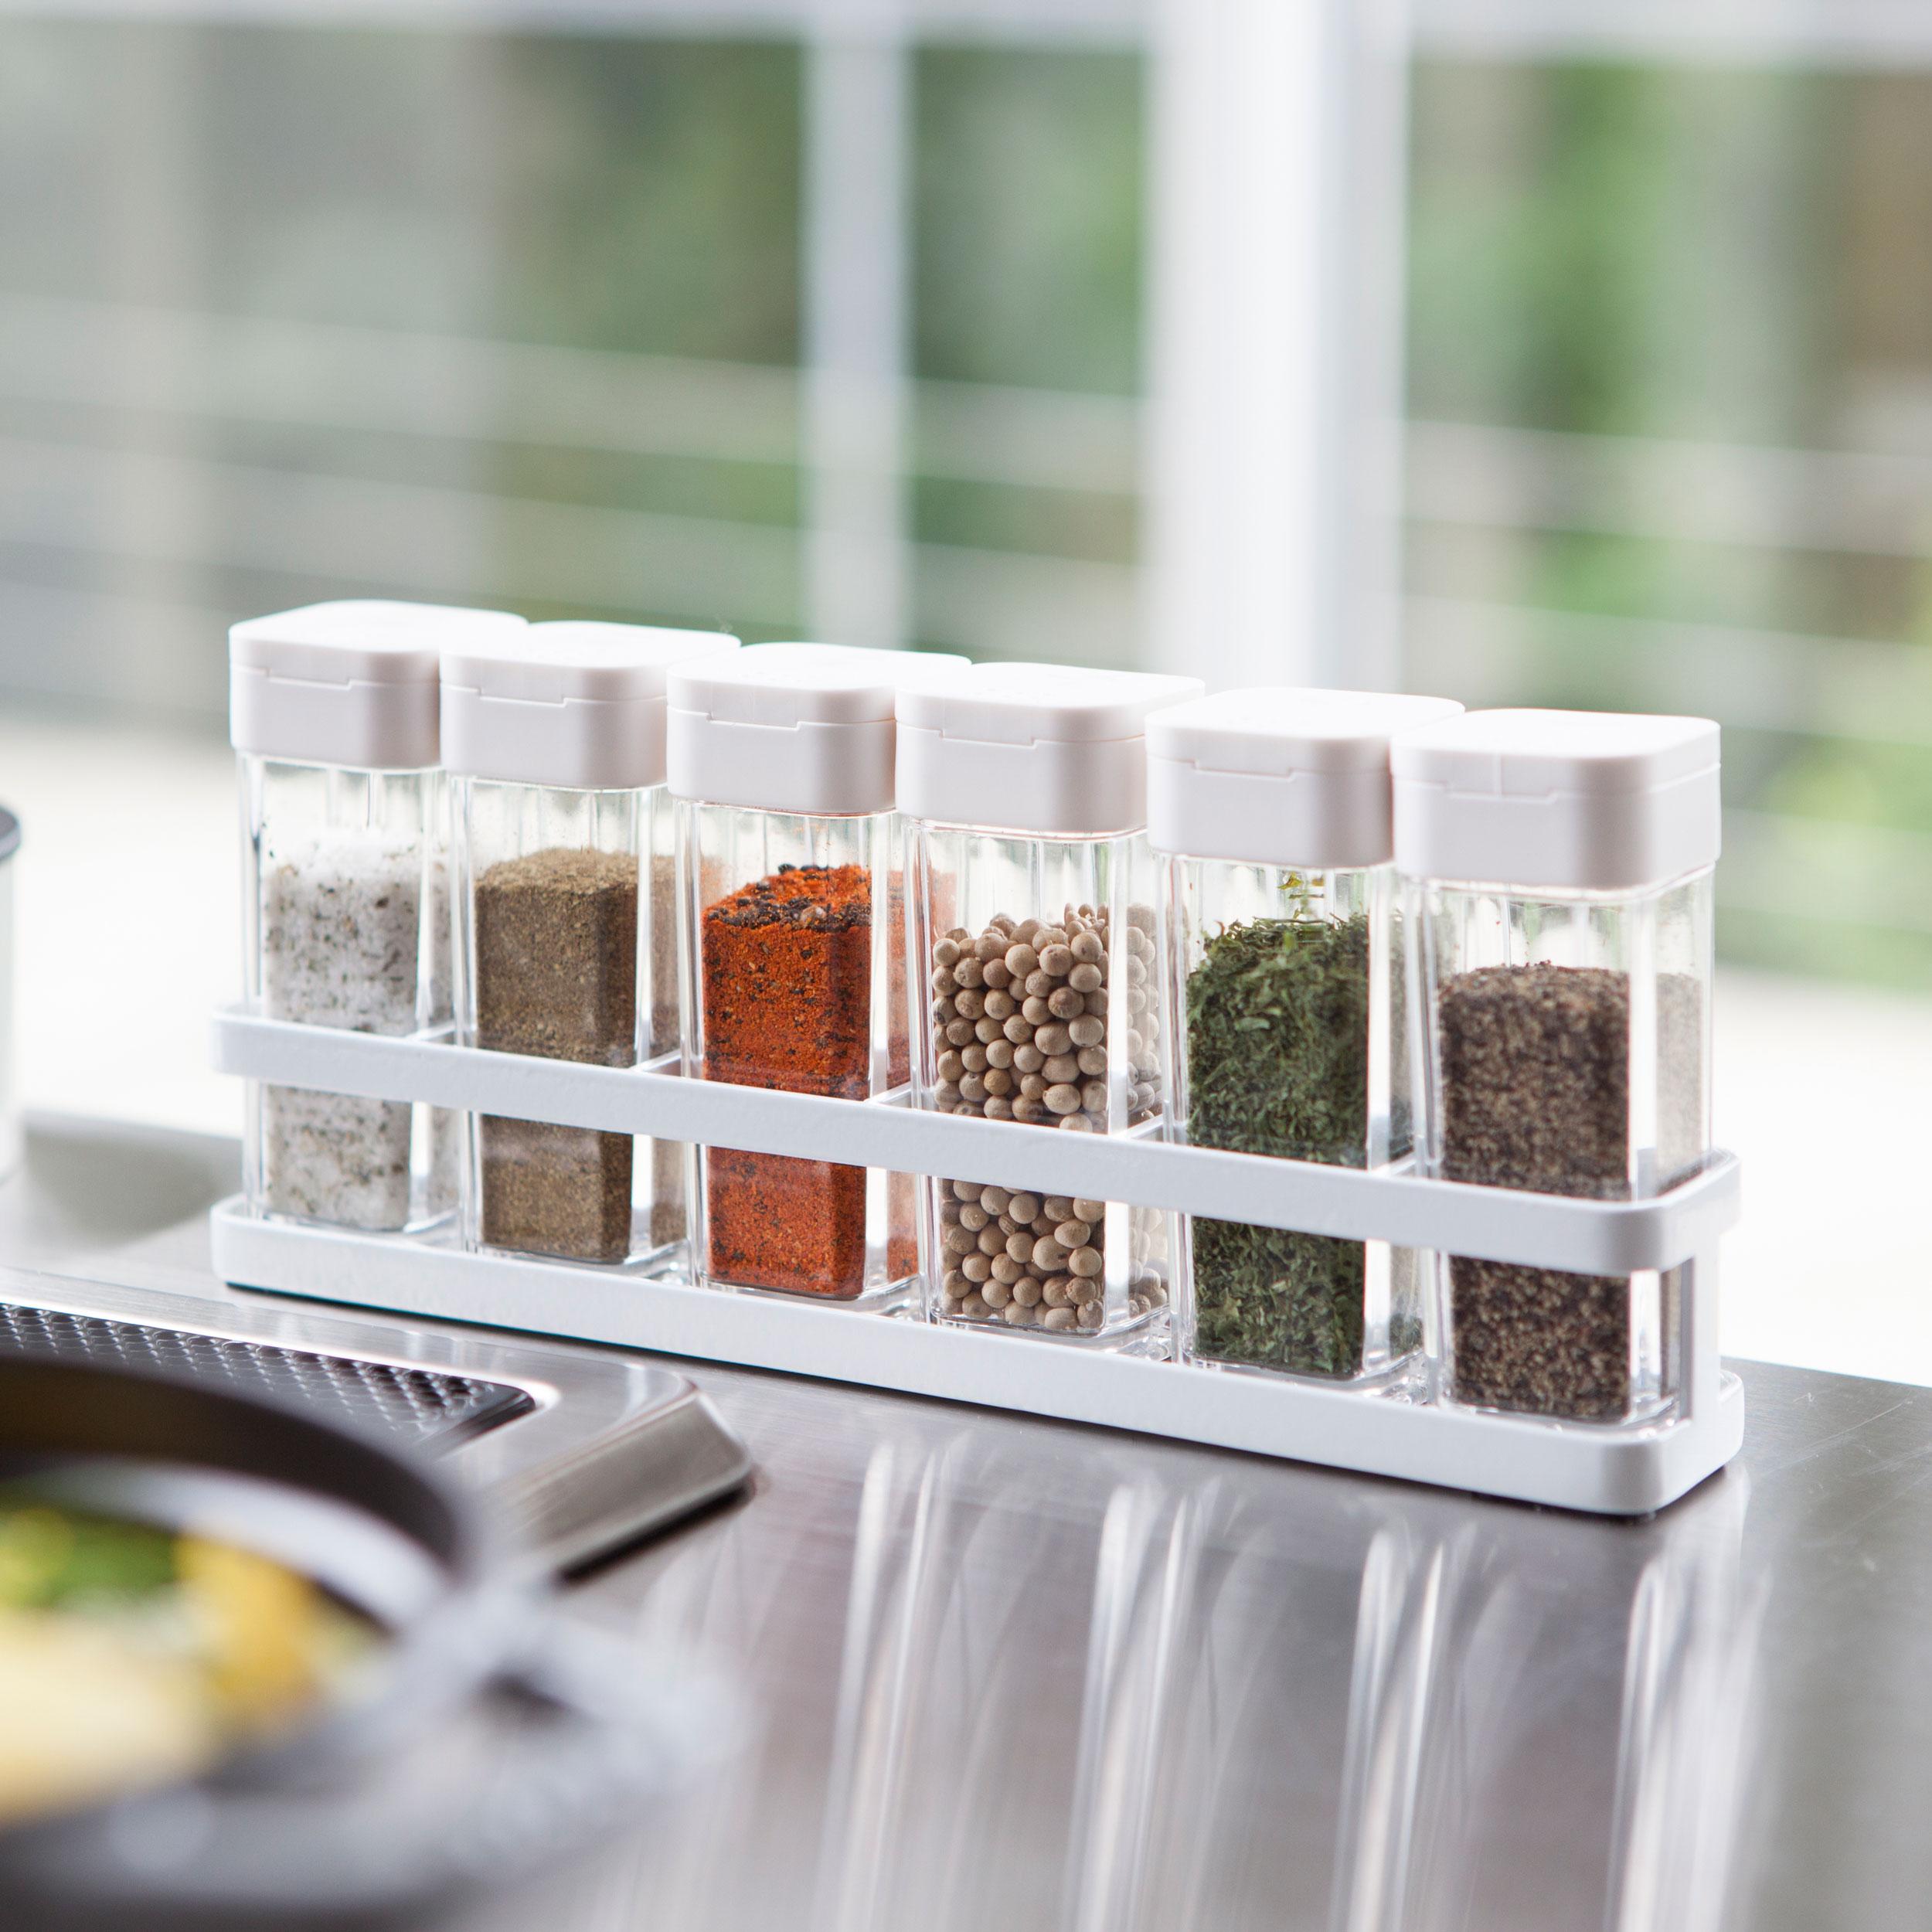 https www aplaceforeverything co uk category yamazaki product spice rack and jars tower ean ean 4903208033473